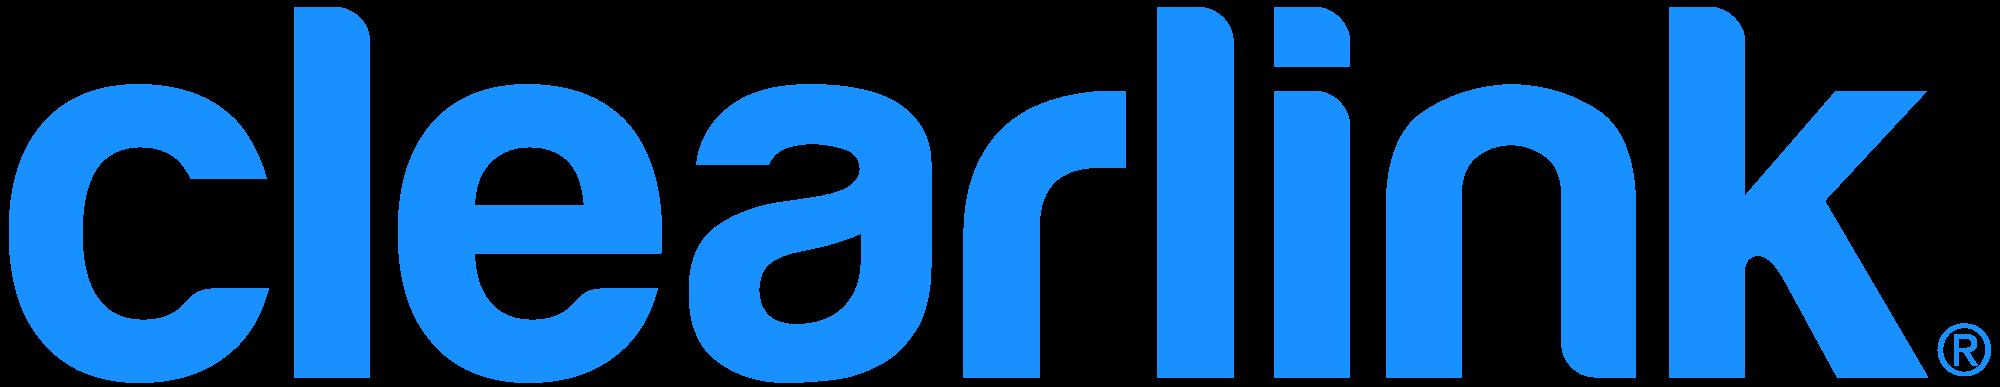 CL_logo_blue-Large (1)